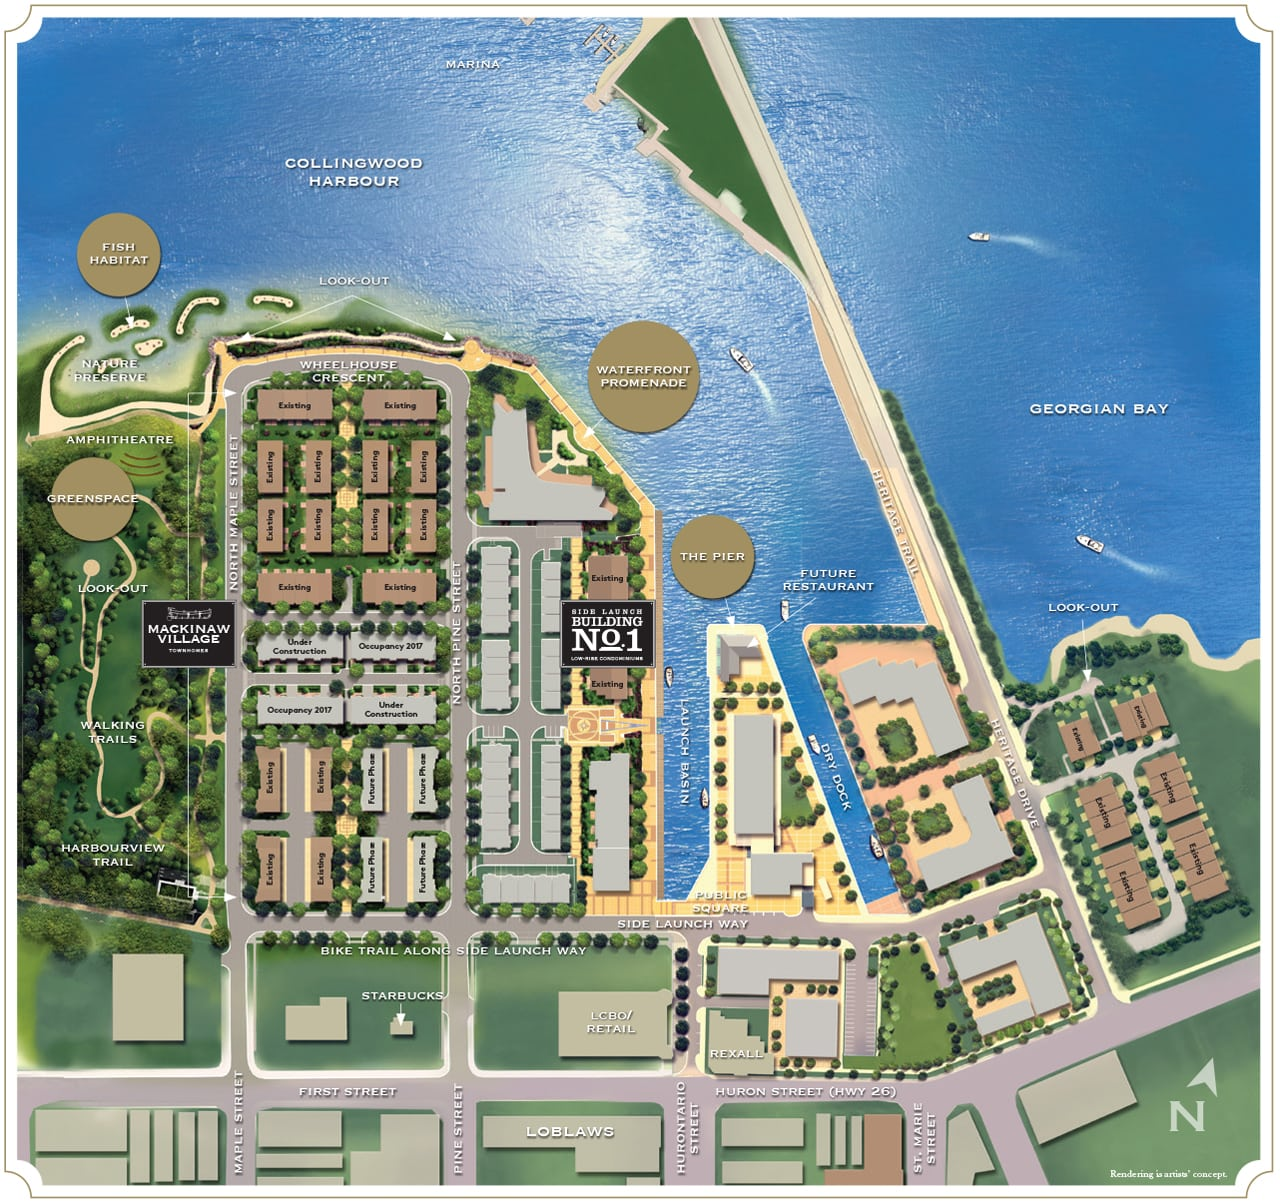 shipyards-master-plan-concept